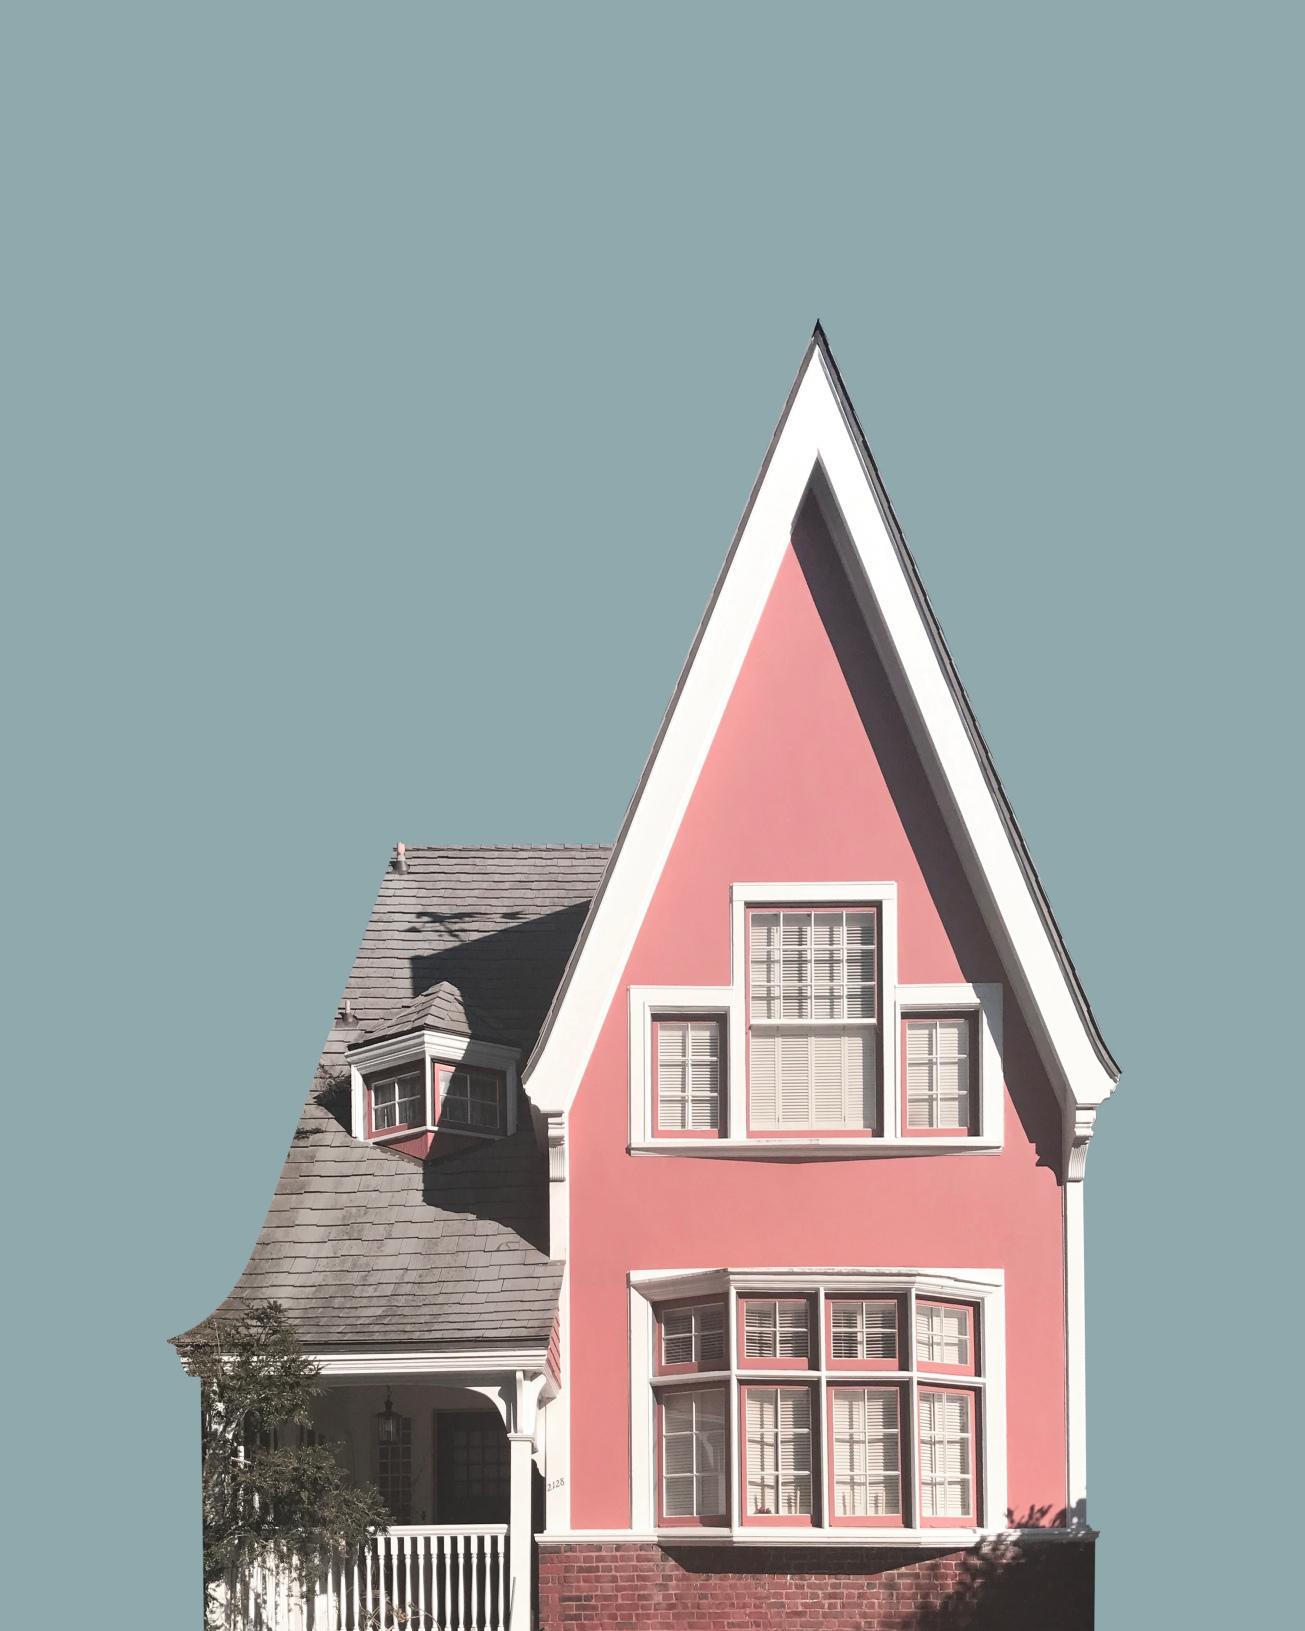 635_HouseHouse